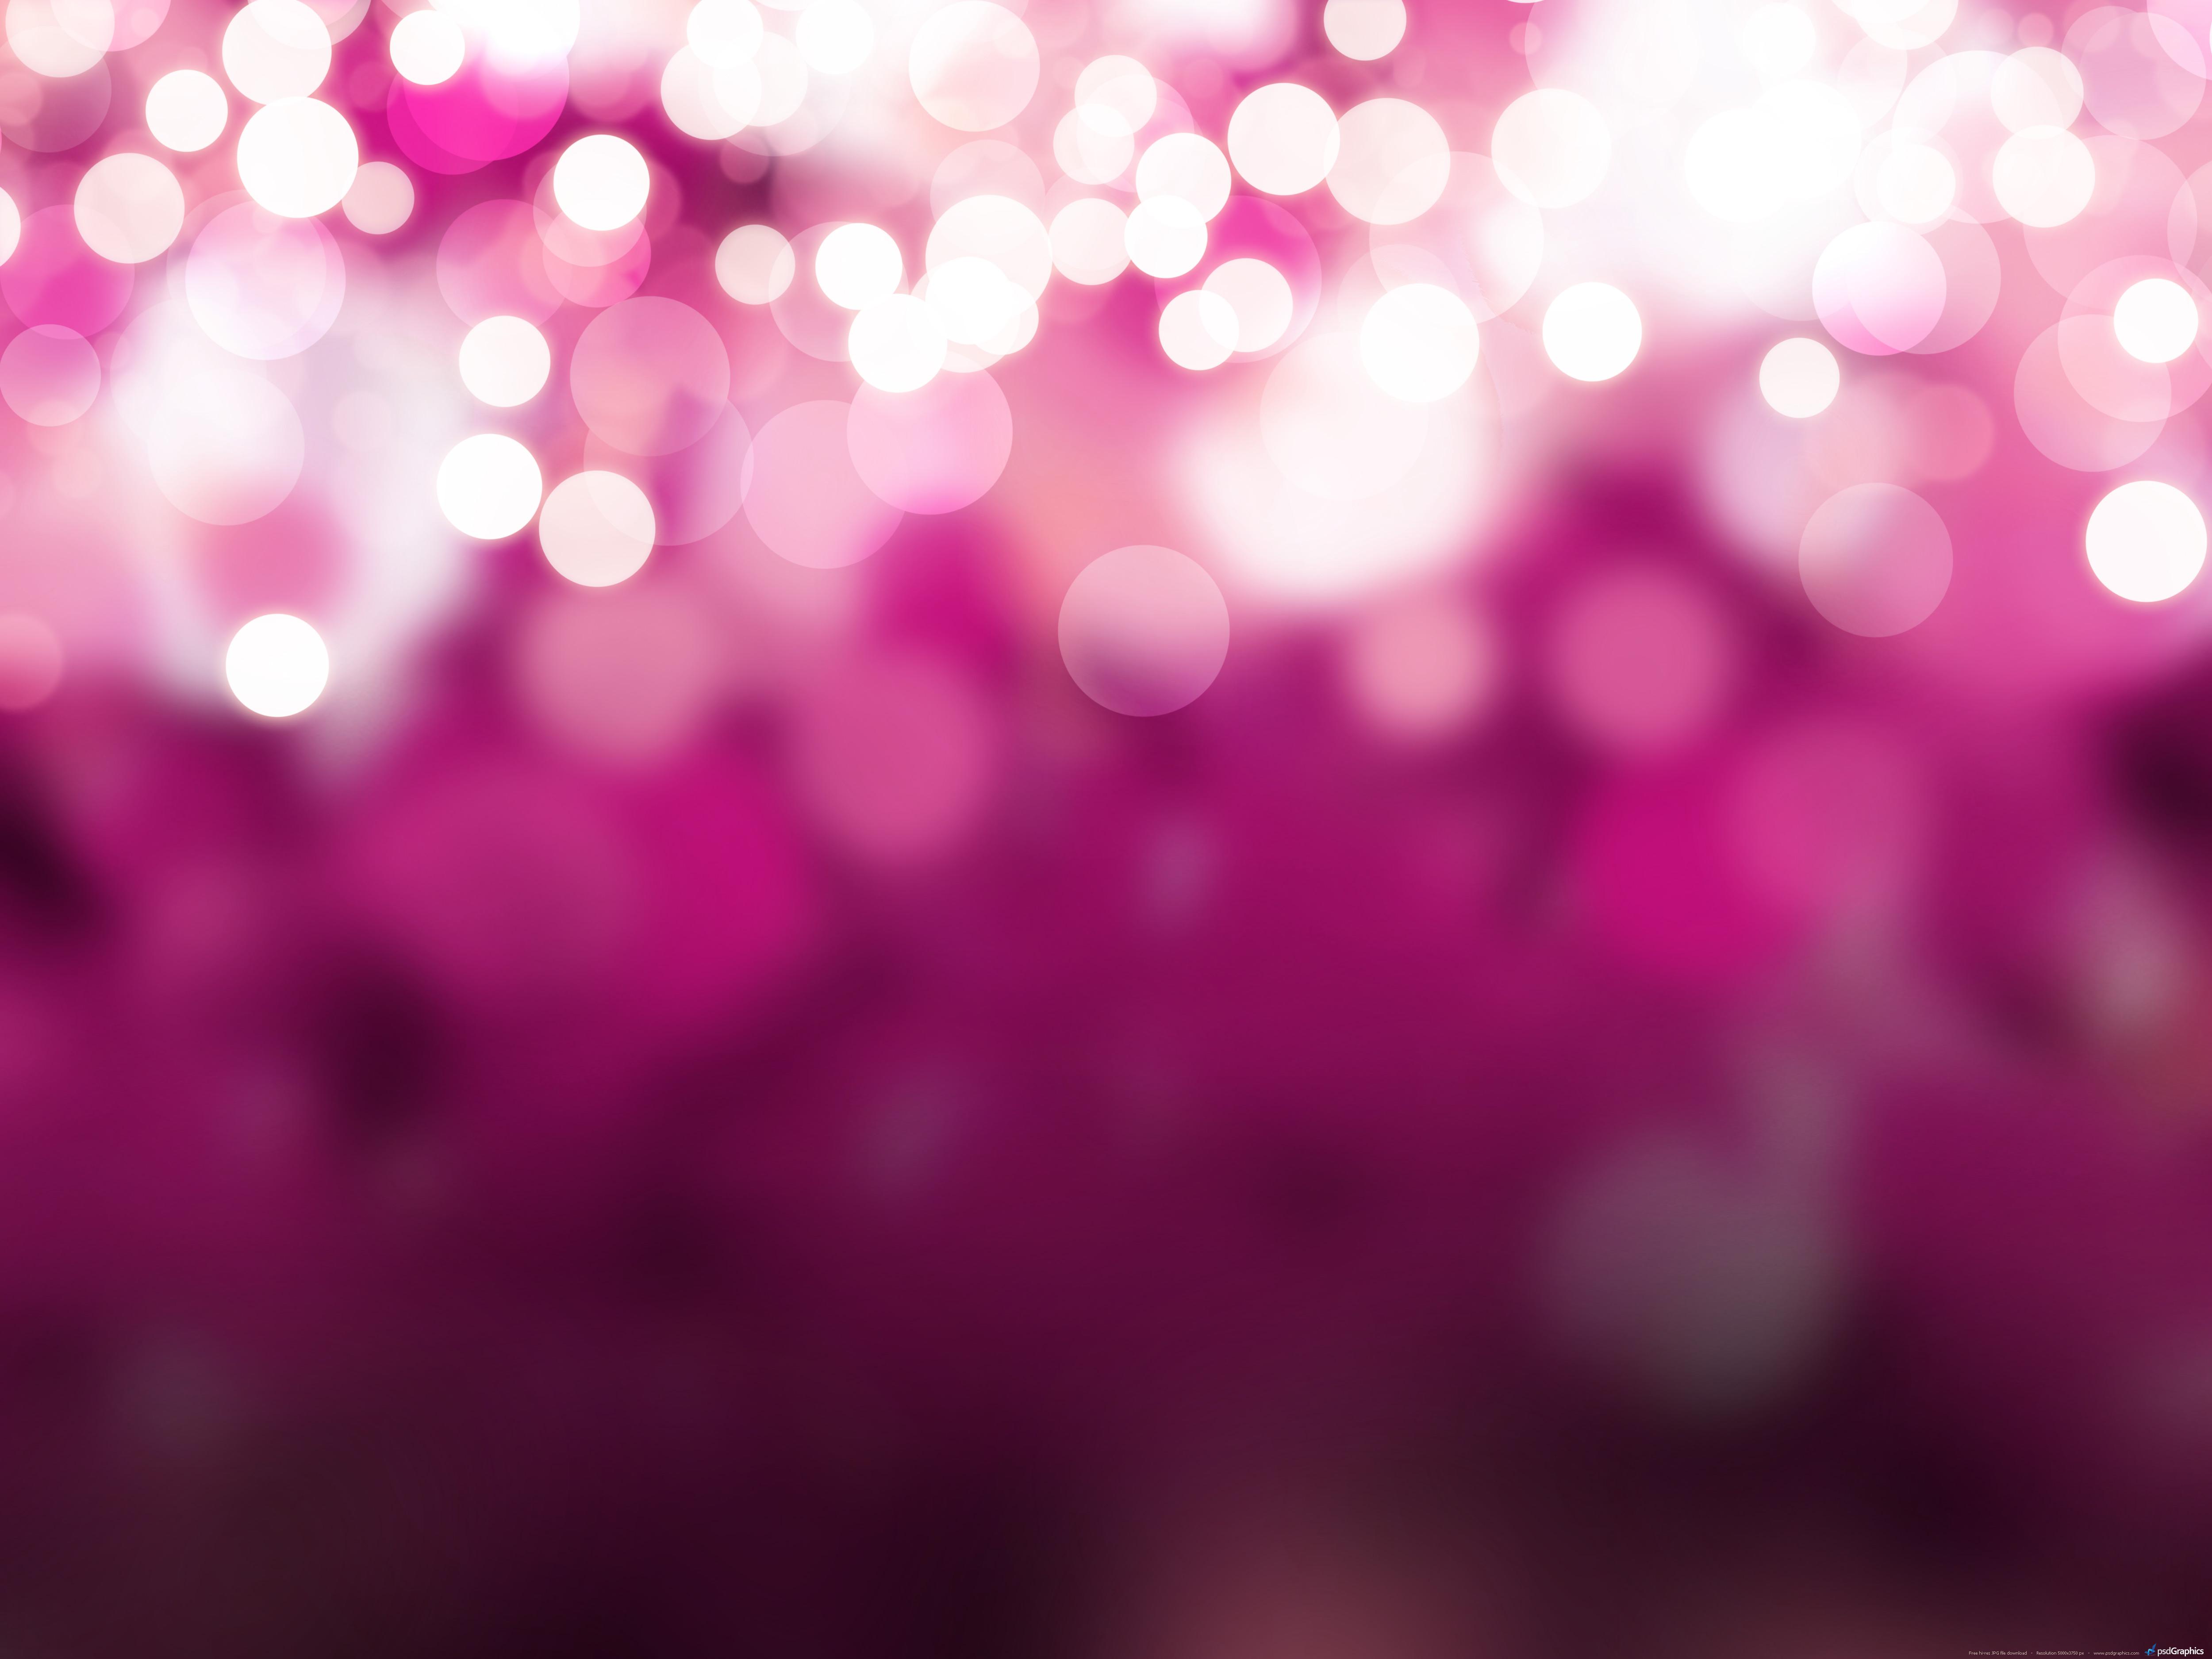 Blurry Christmas Lights Background Psdgraphics #Dt0oAm.